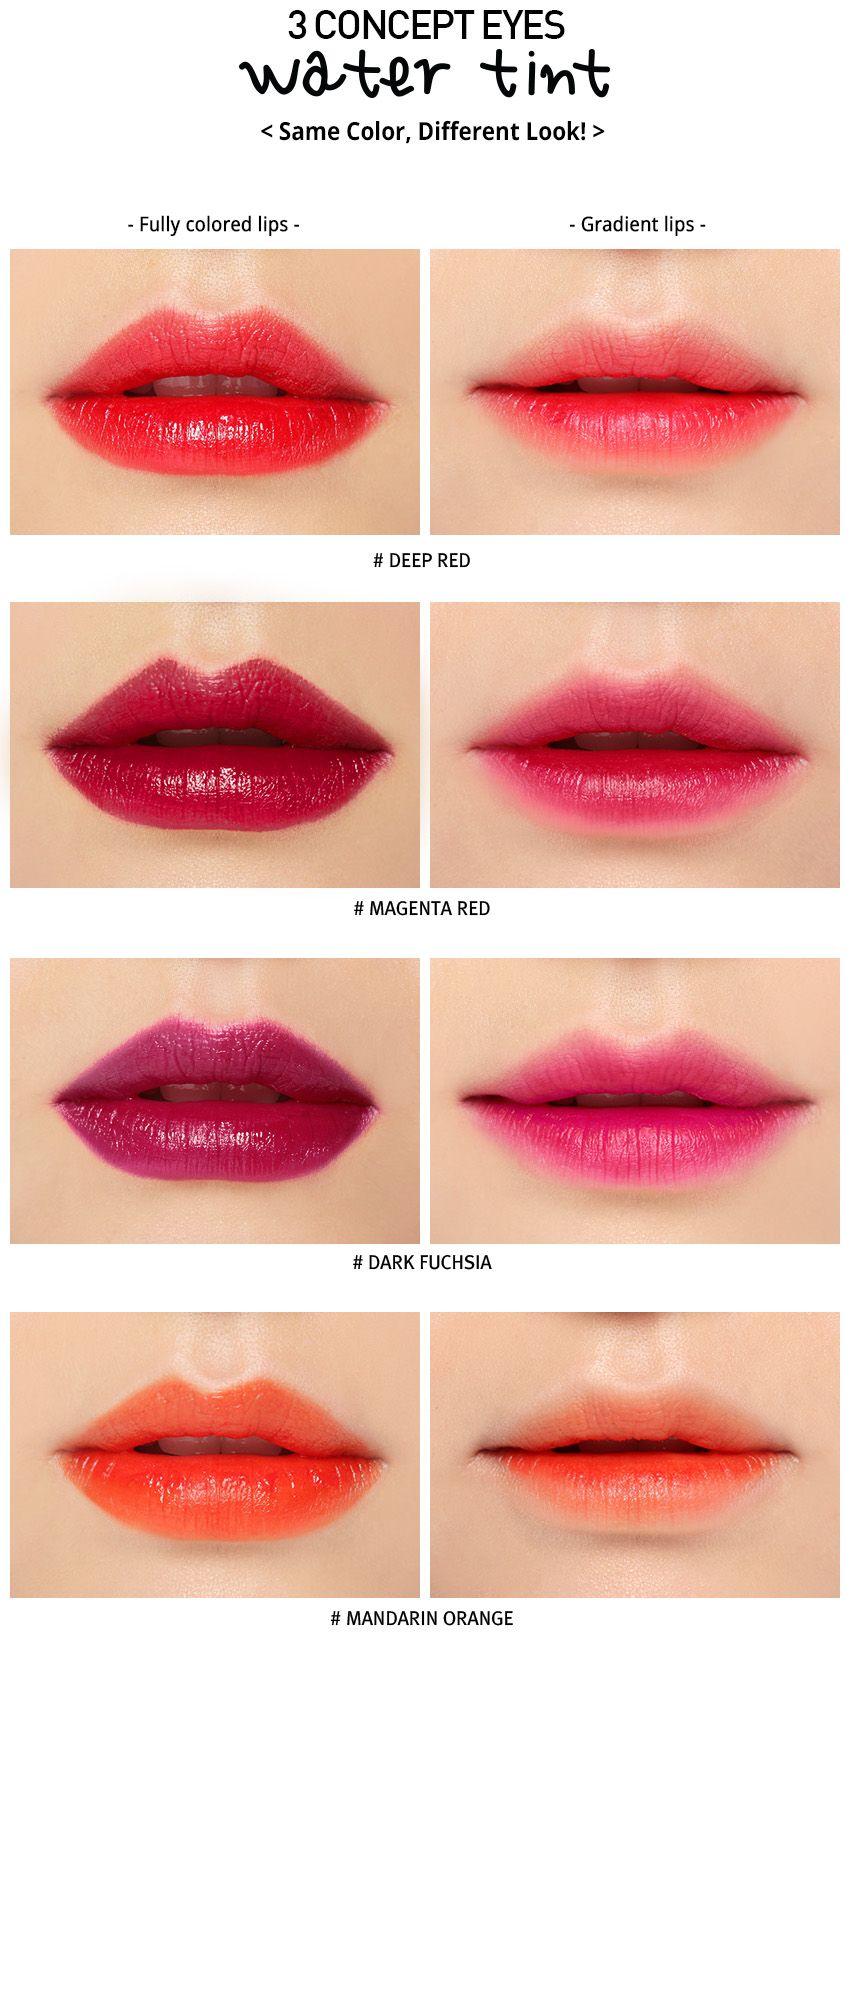 3ce Water Tint Dark Fuchsia Stylenanda Makeup Brushes Guide